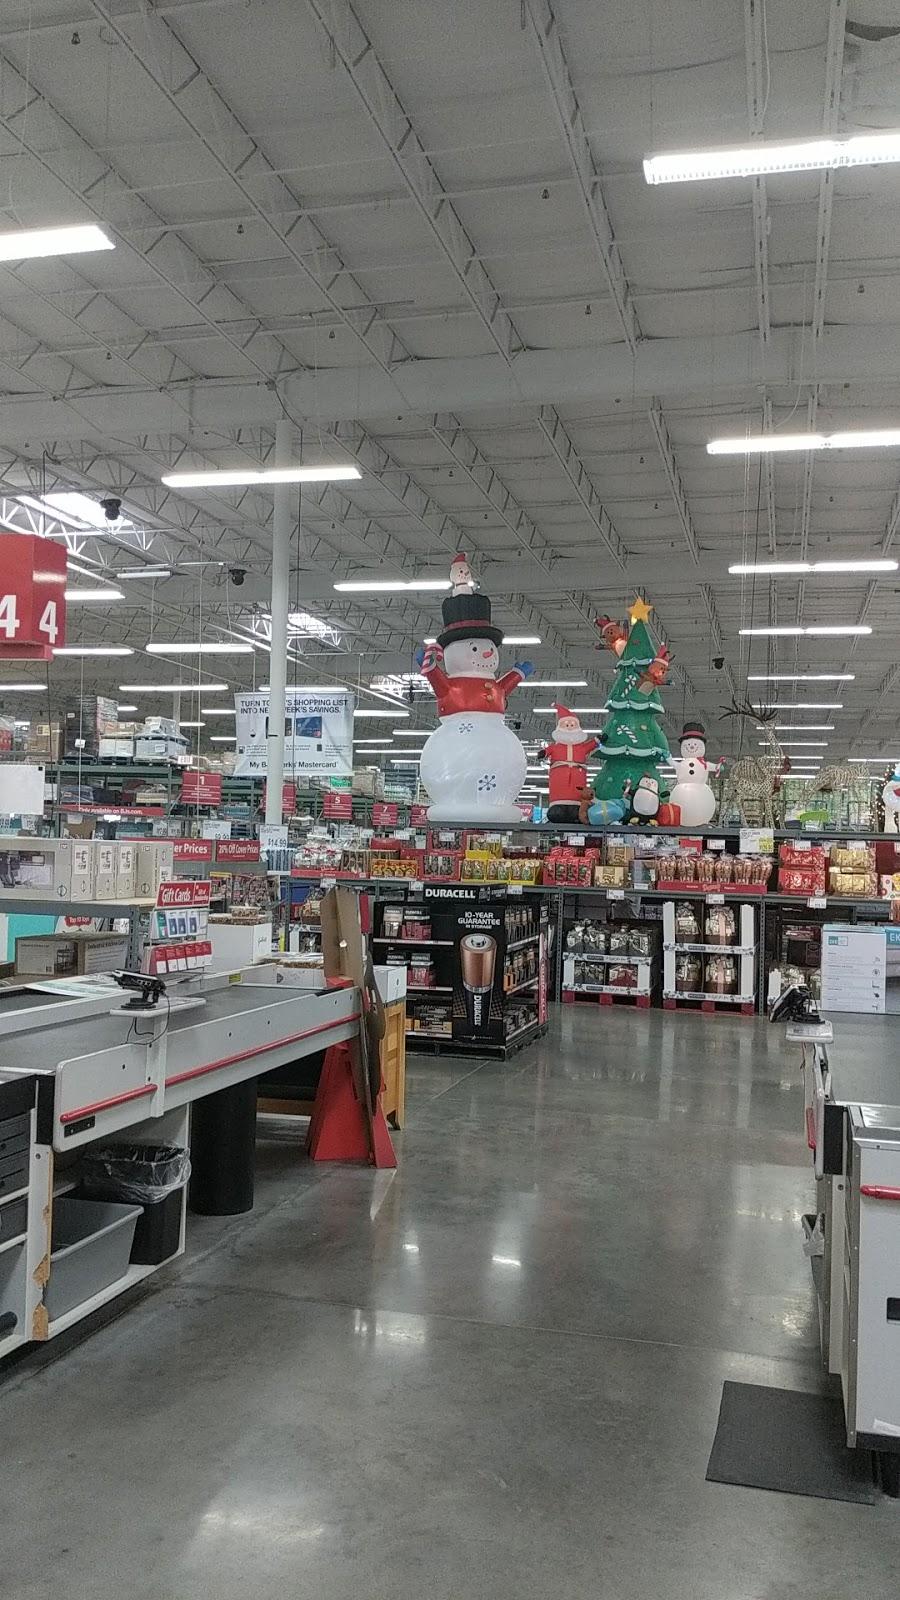 BJs Wholesale Club - gas station  | Photo 8 of 10 | Address: 8811 Brier Creek Pkwy, Raleigh, NC 27617, USA | Phone: (919) 806-5000